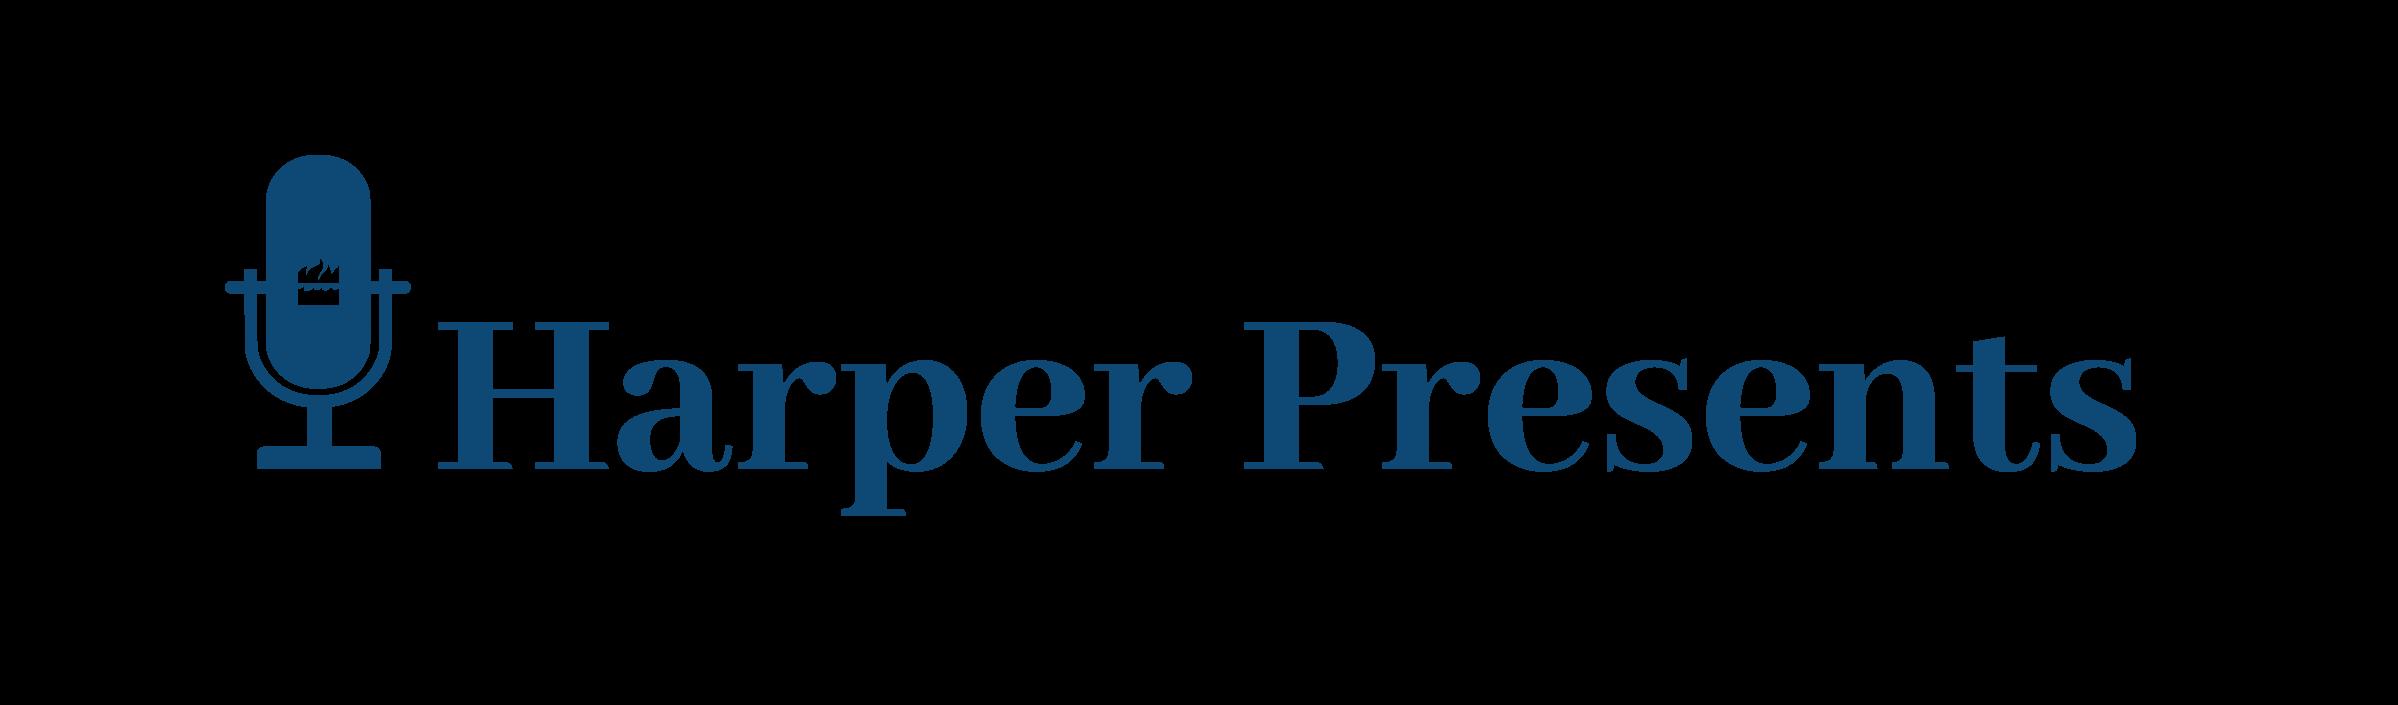 HarperPresents-mockups12_-Horizontal